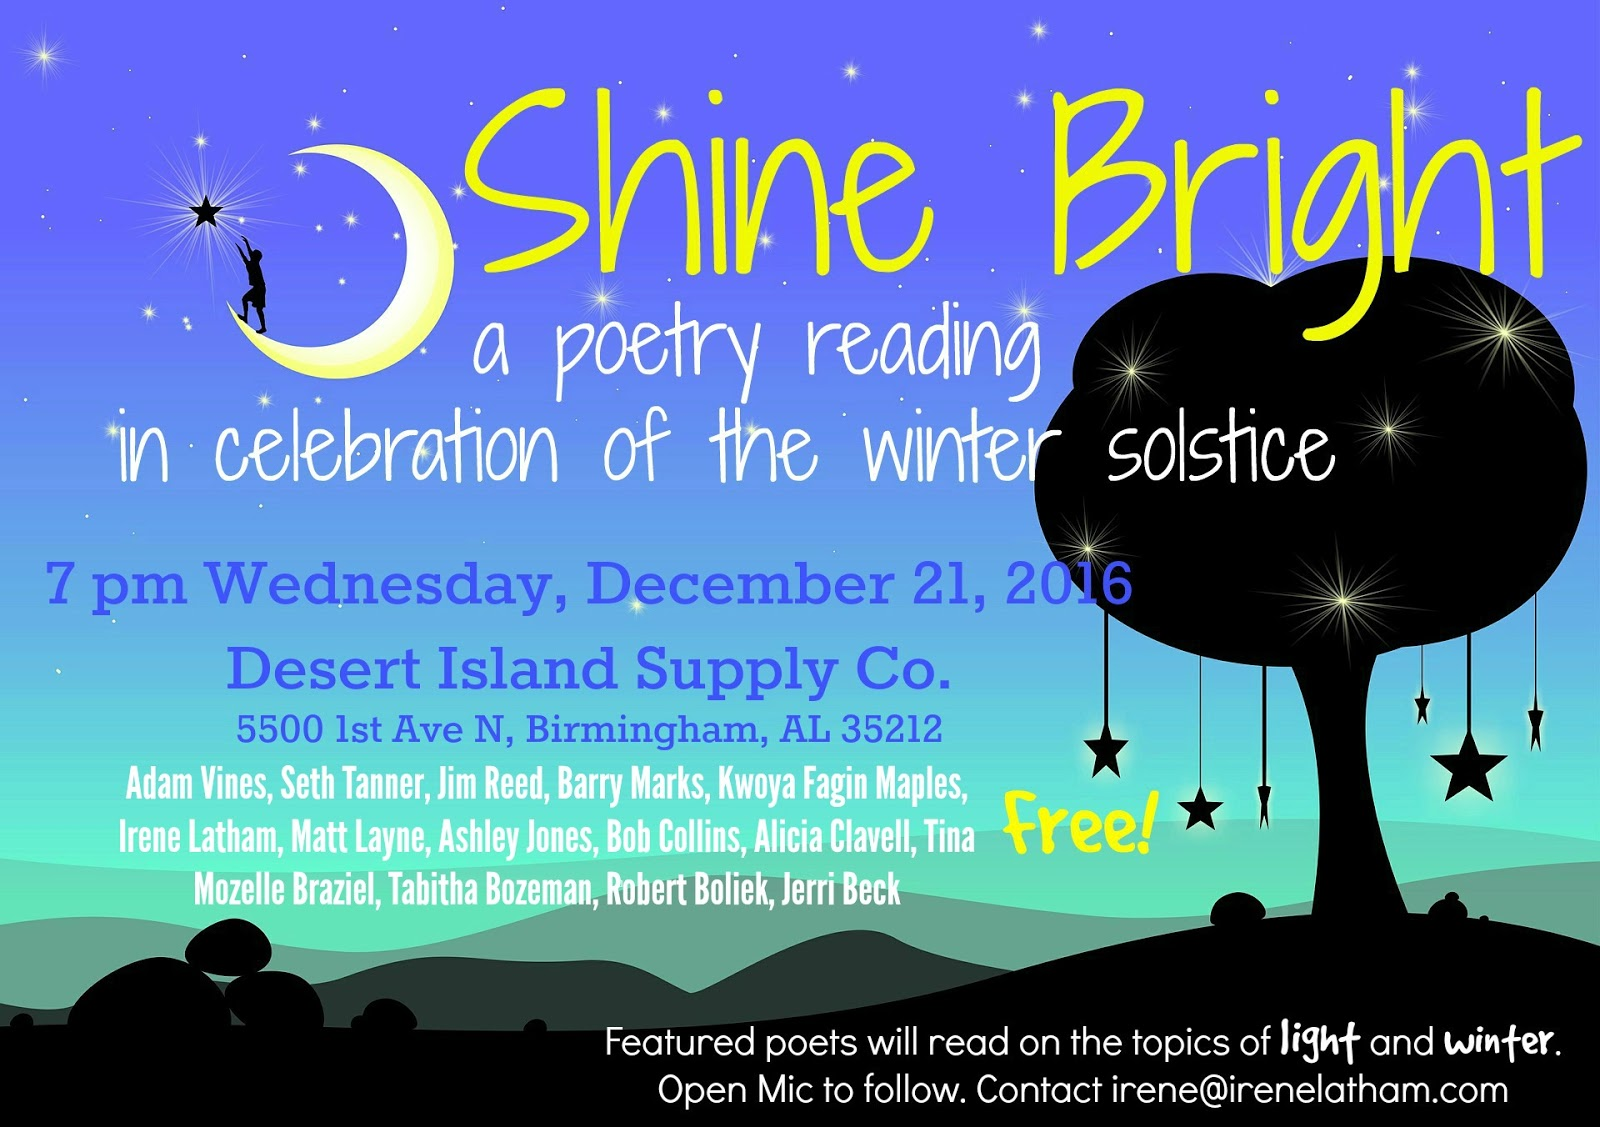 Live Your Poem Poem For The Winter Solstice